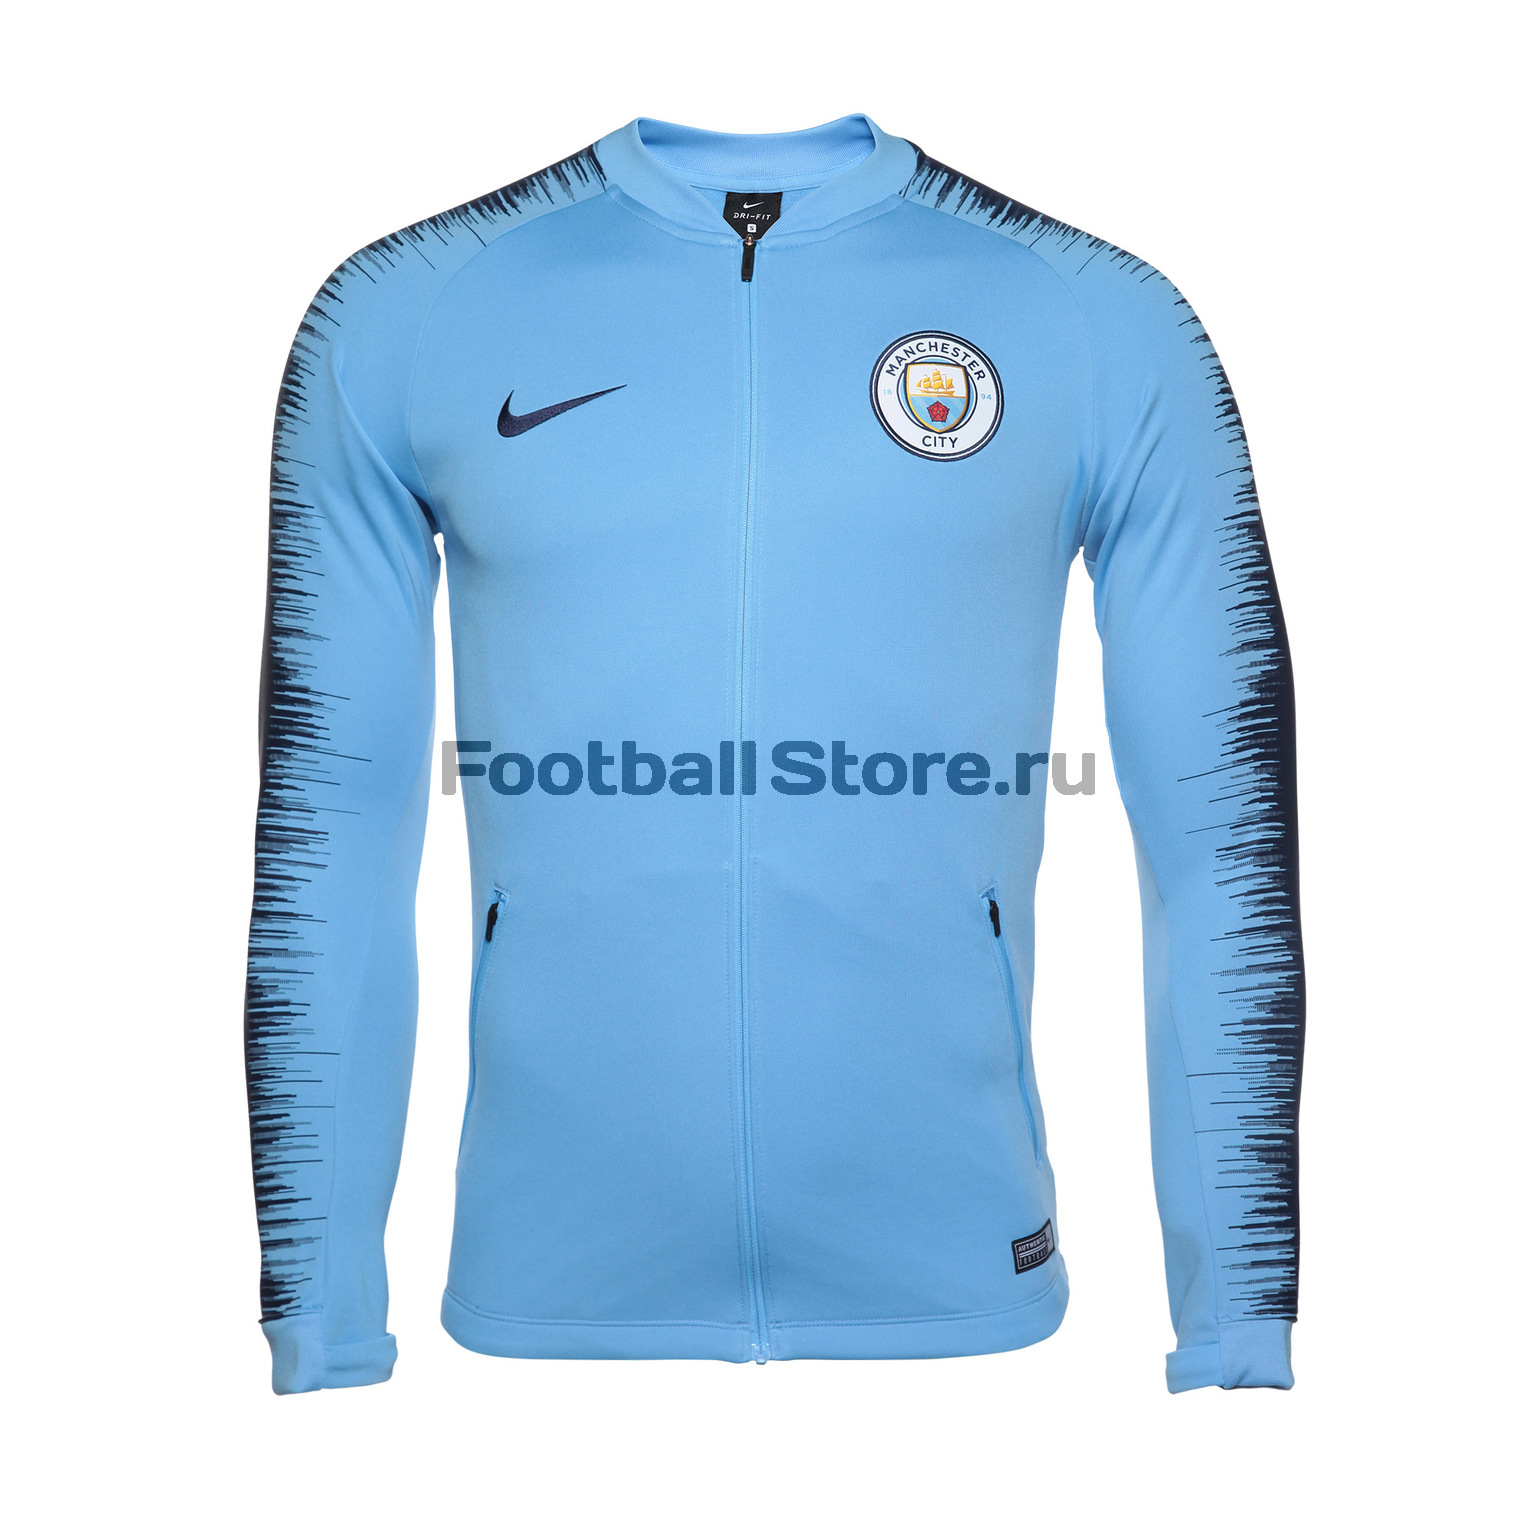 65dc931c3 Олимпийка Nike Manchester City 894363-488 олимпийка nike manchester city  894363 488